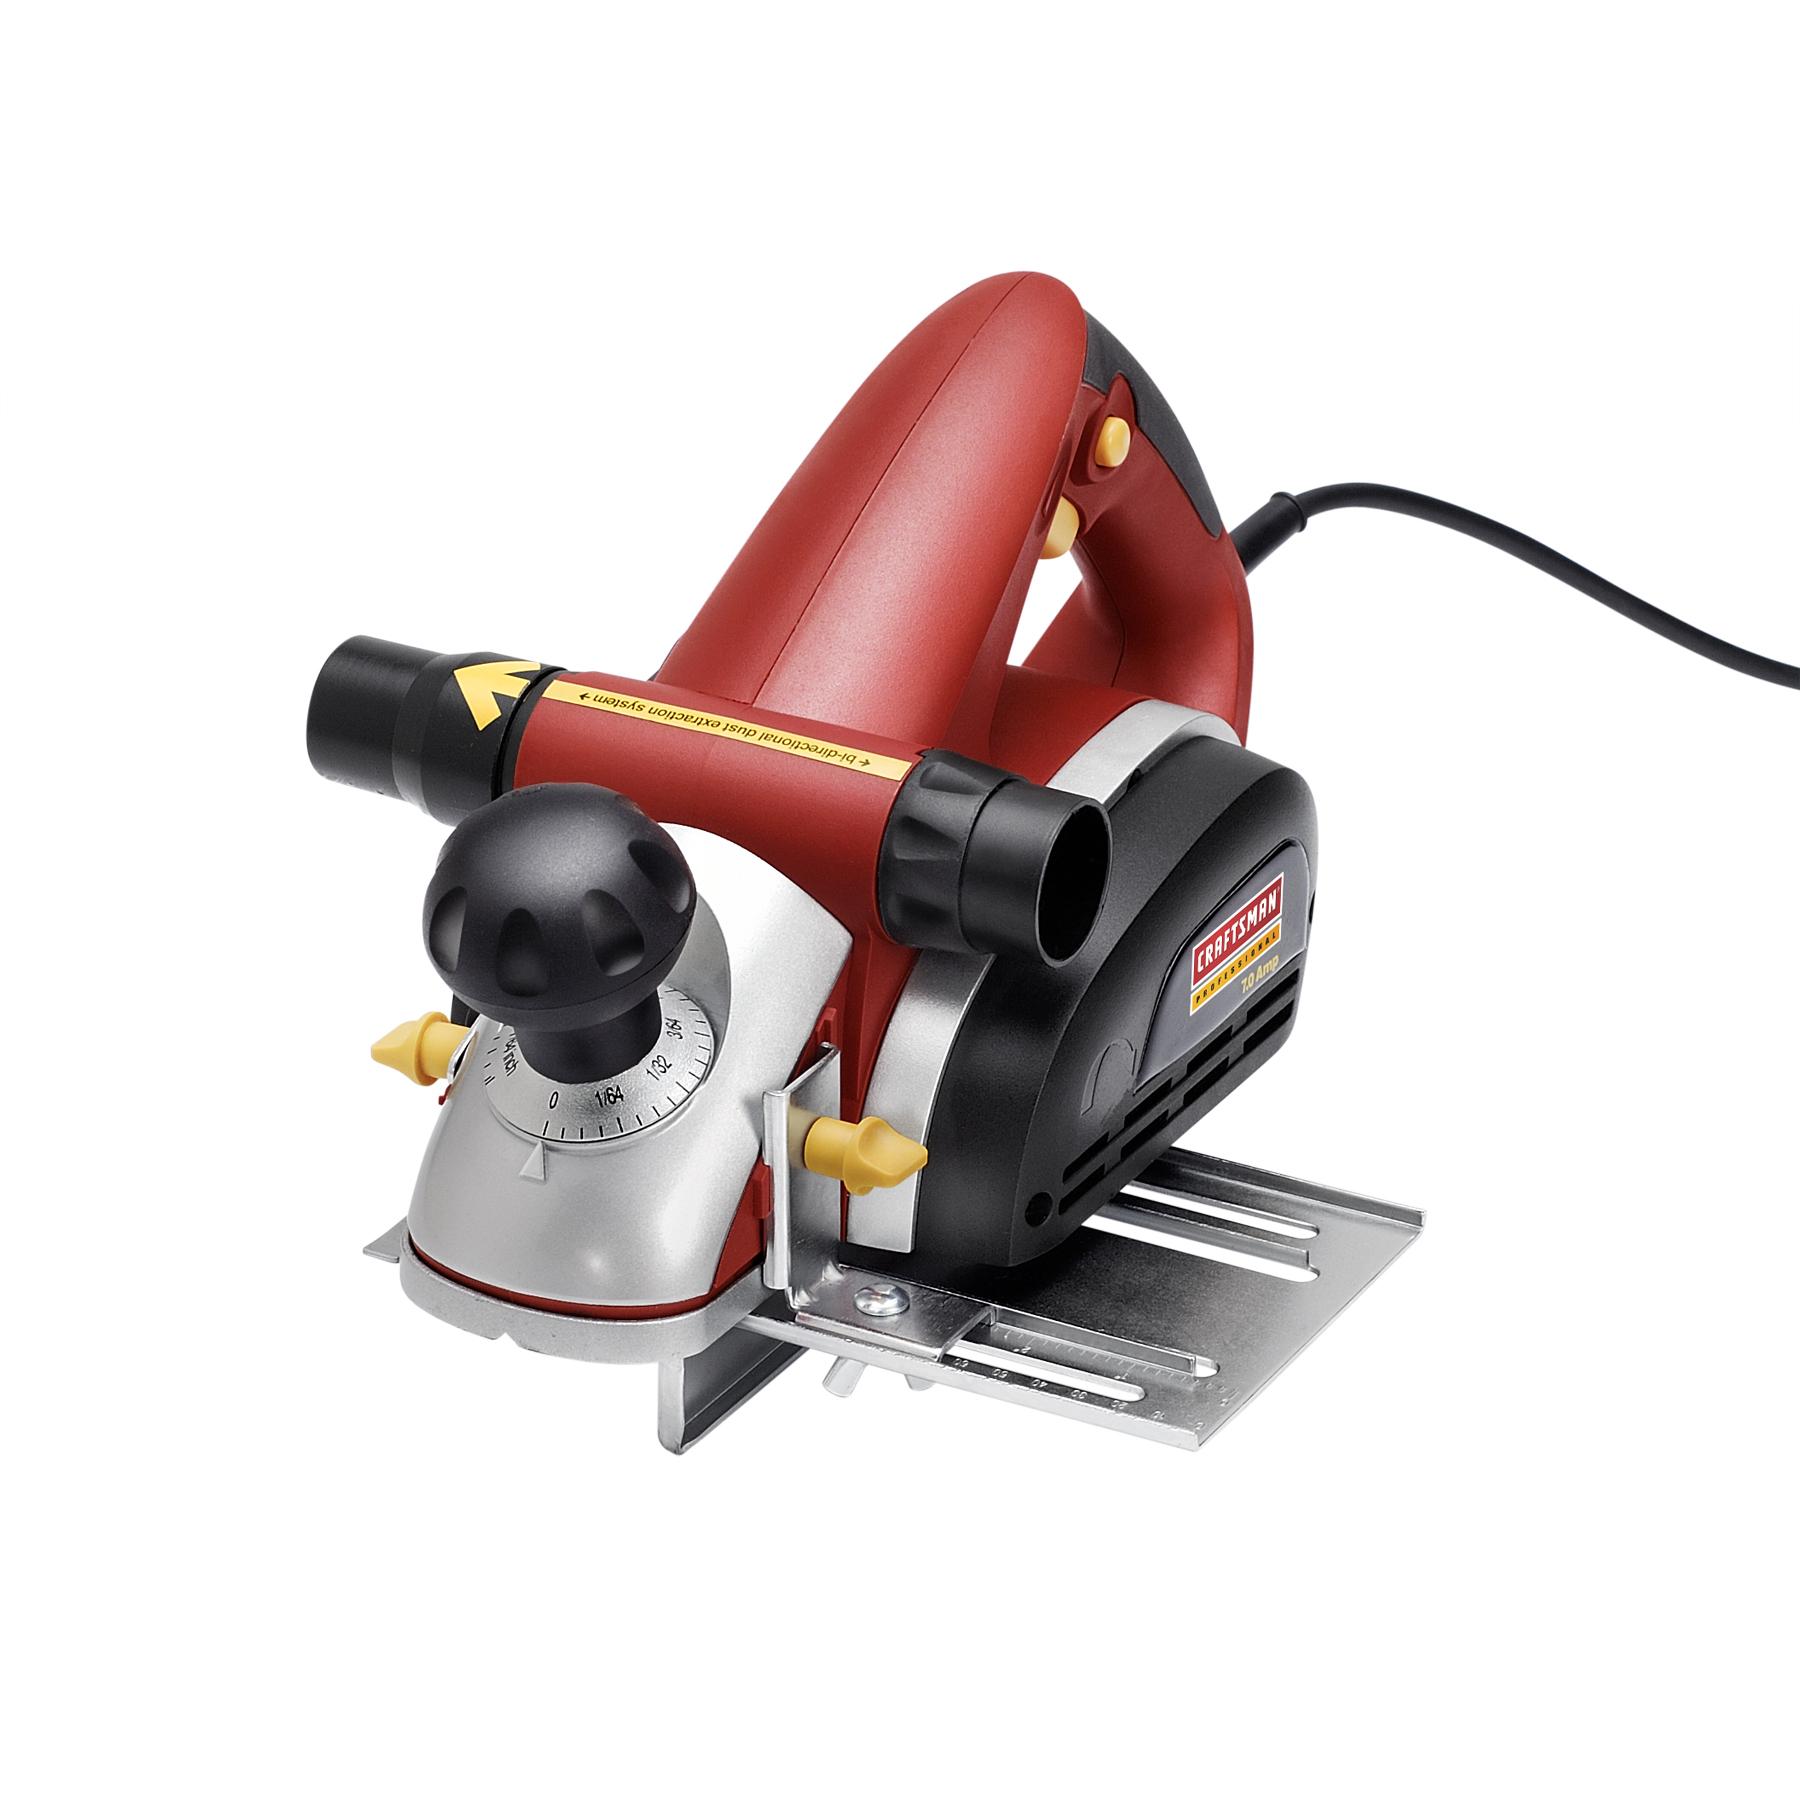 Craftsman Professional 26729 7 Amp Corded 3-1 4